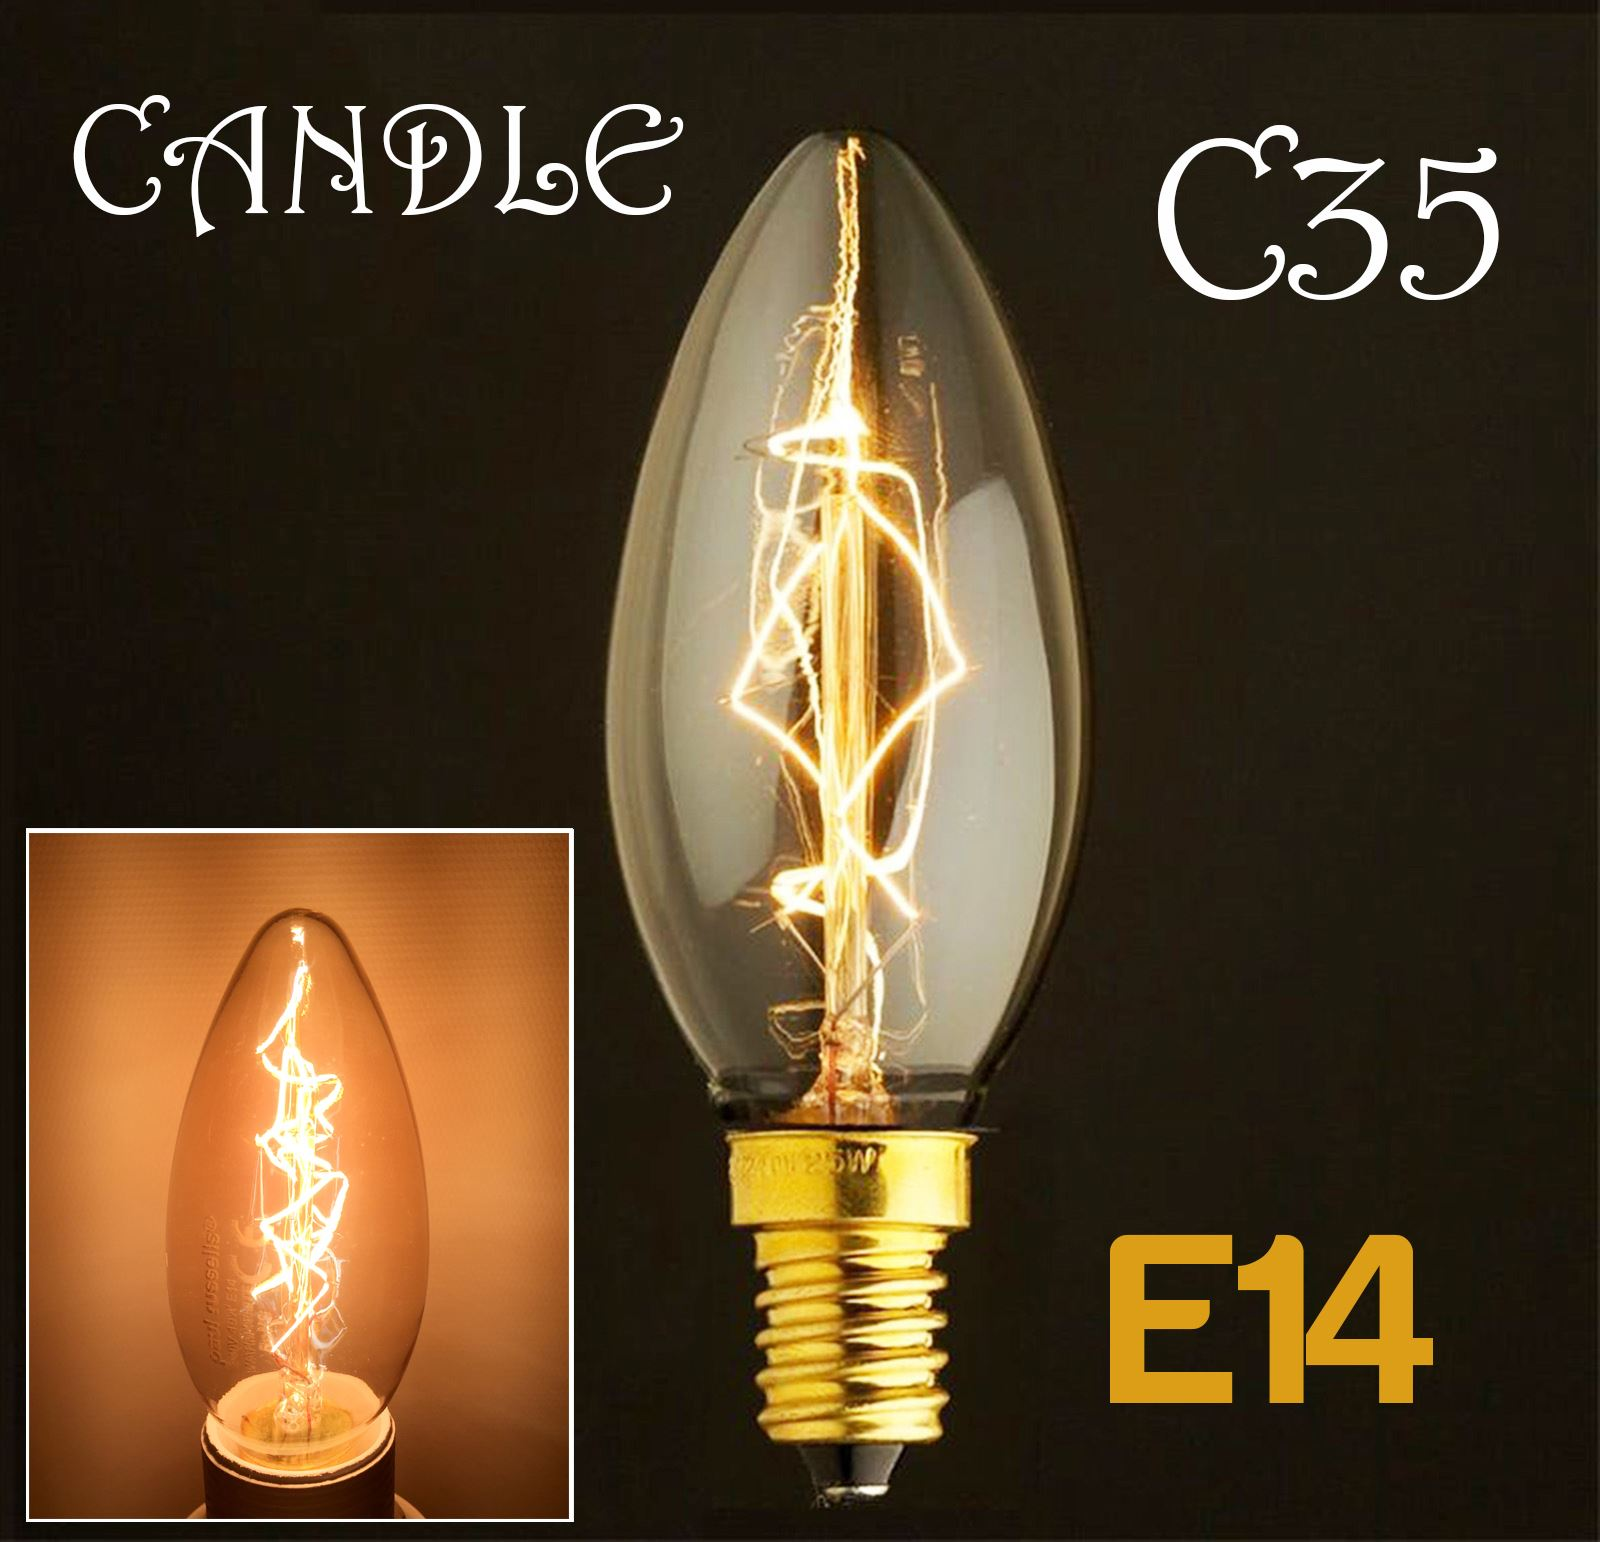 Affinity 4 2w 40w Filament Led Gls Es E27 Clear Light: Dimmable E27 E14 B22 40W Edison Vintage Filament Candle